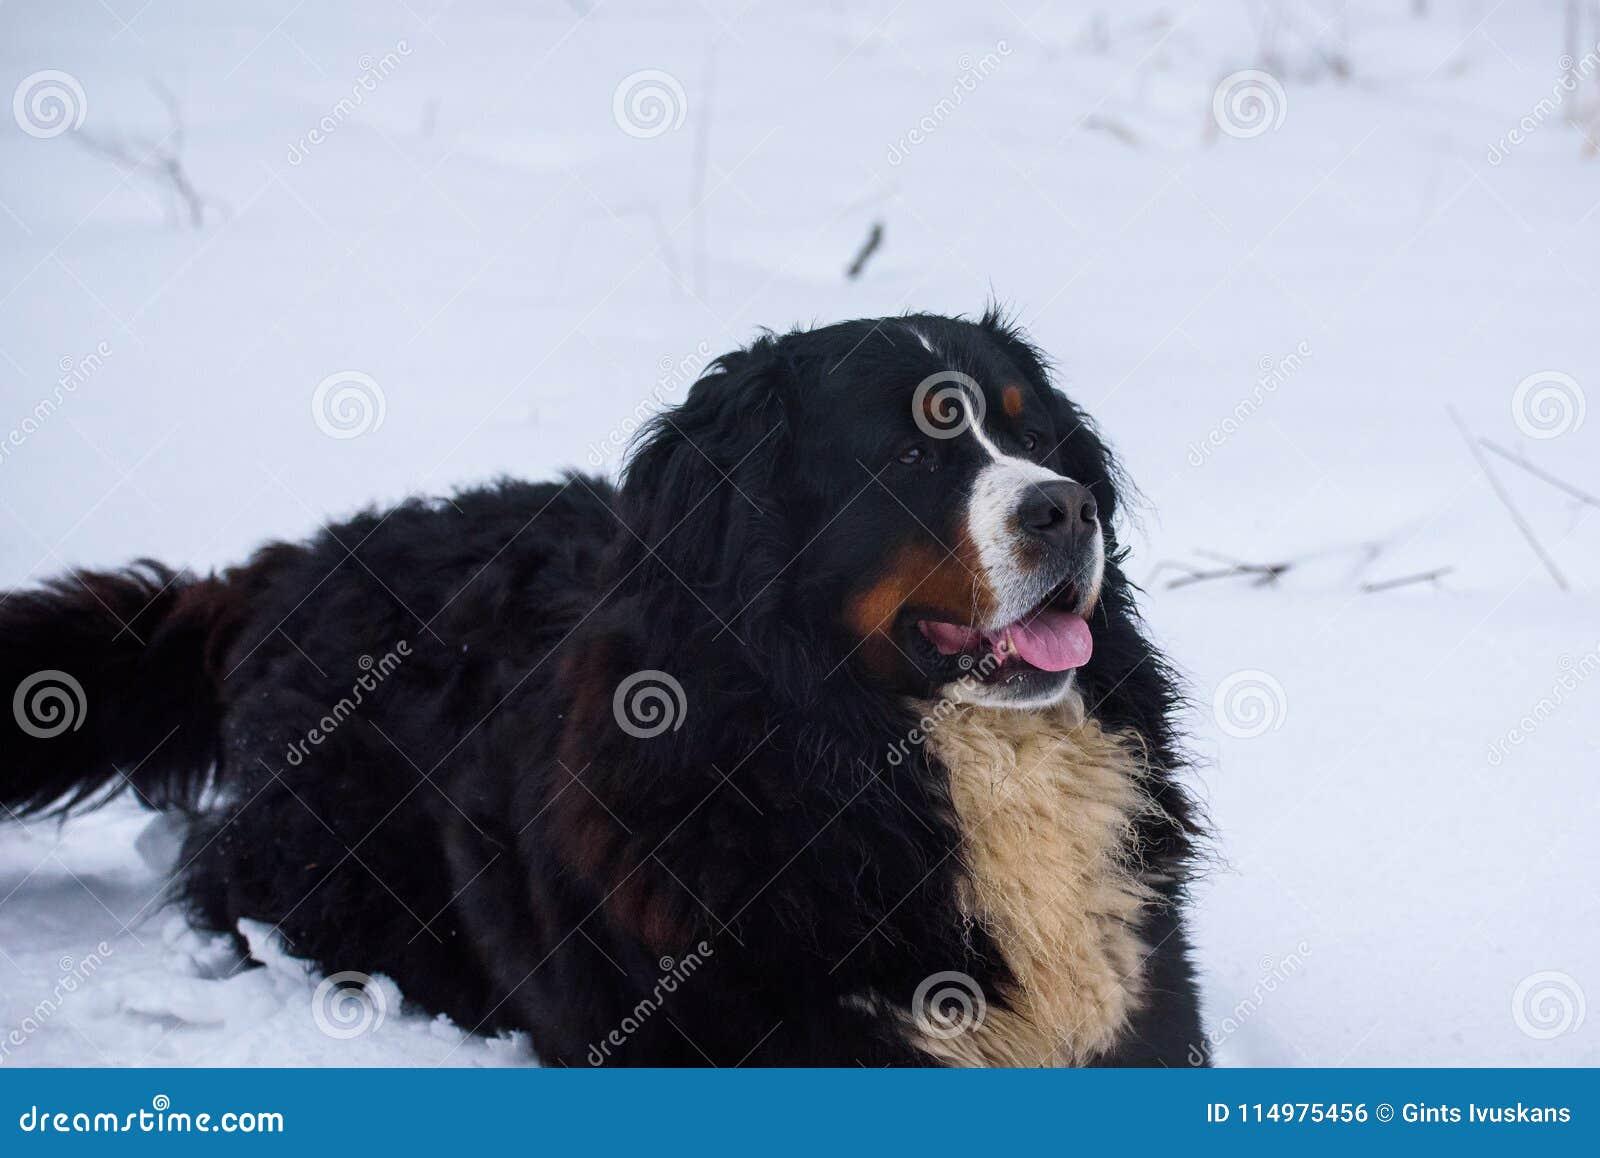 Bernese Mountain Dog Eating Snow Stock Photo Image Of Snow